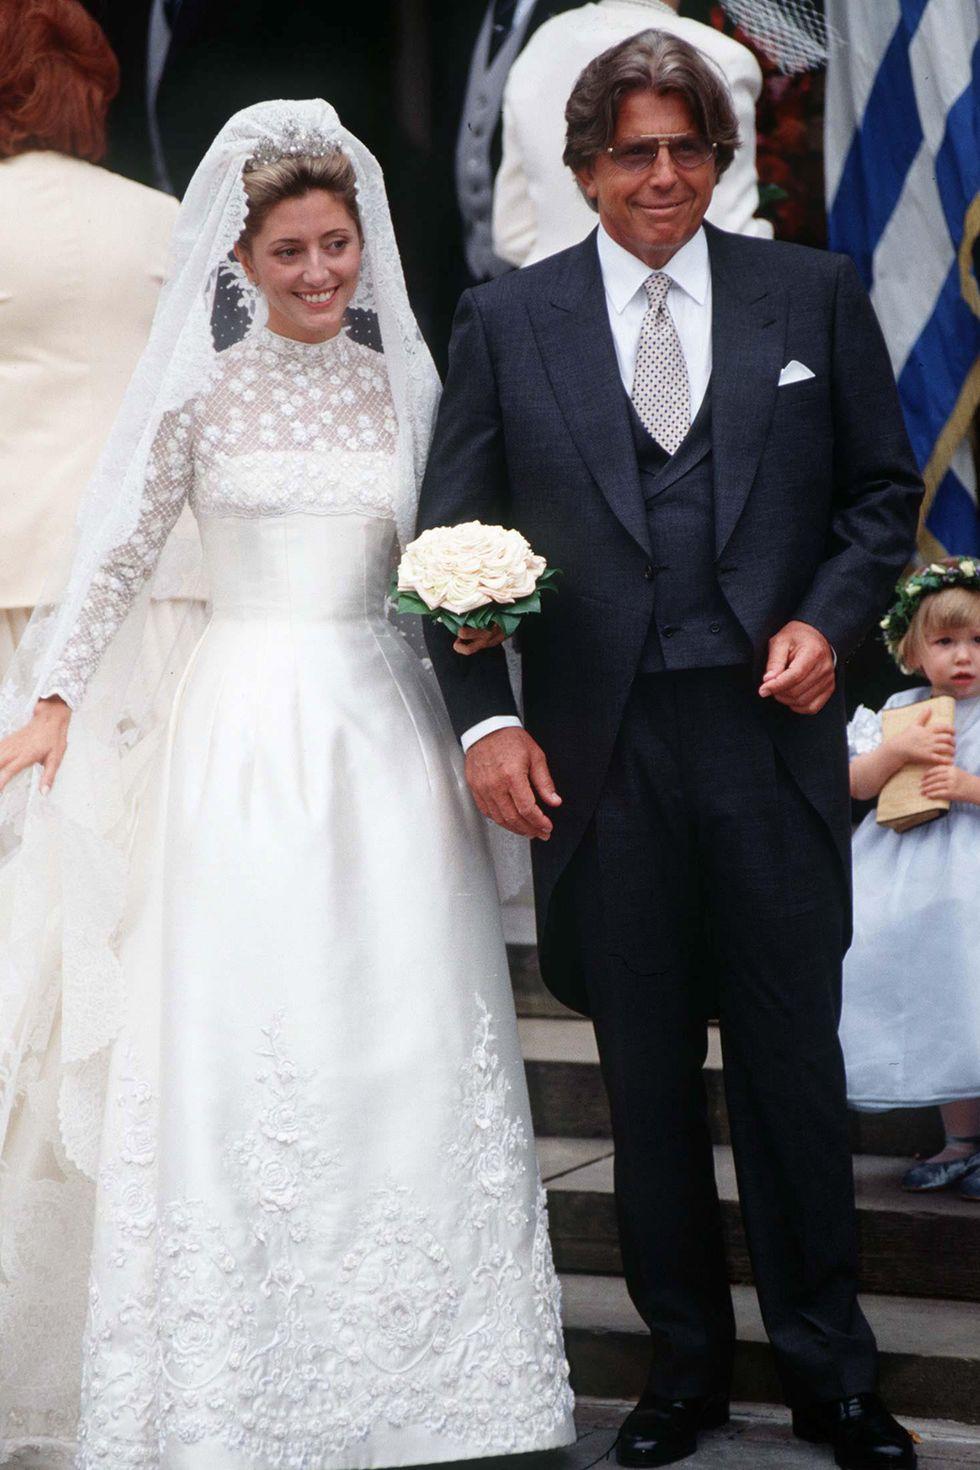 Princess Marie-Chantel of Greece and Her Father Robert Miller